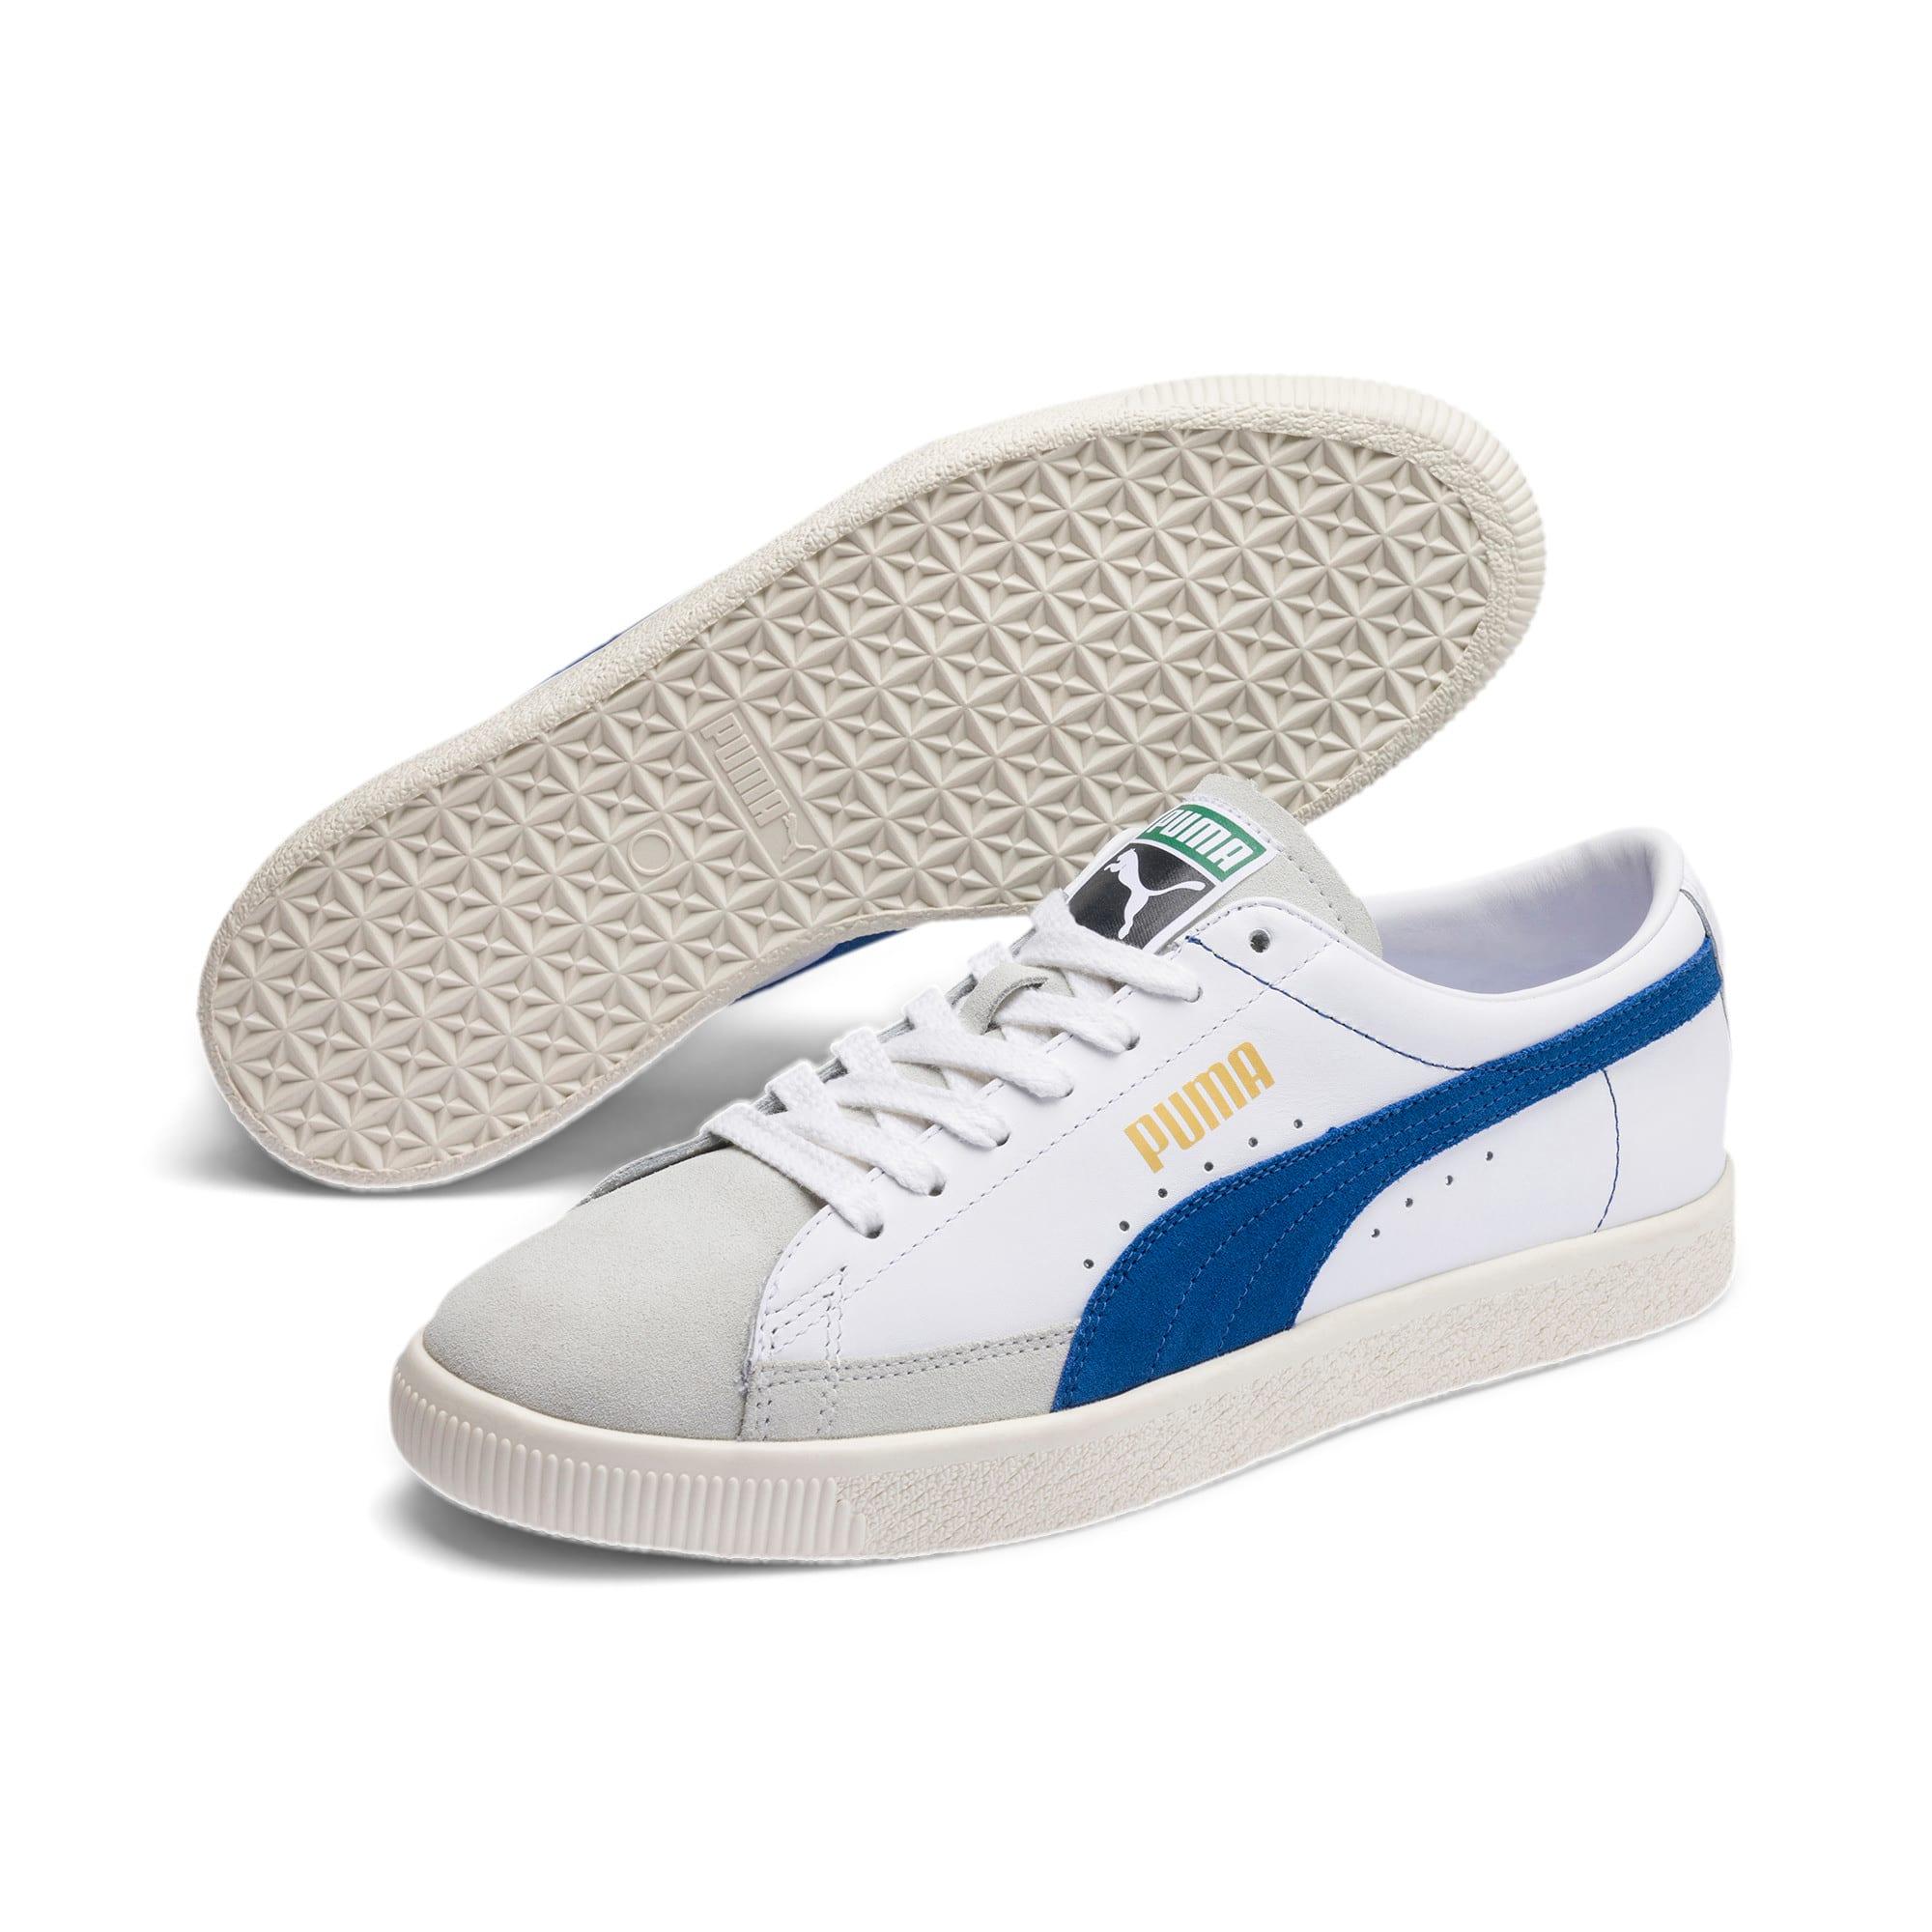 Thumbnail 2 of Basket 90680 Sneakers, Puma White-Galaxy Blue-Whisp, medium